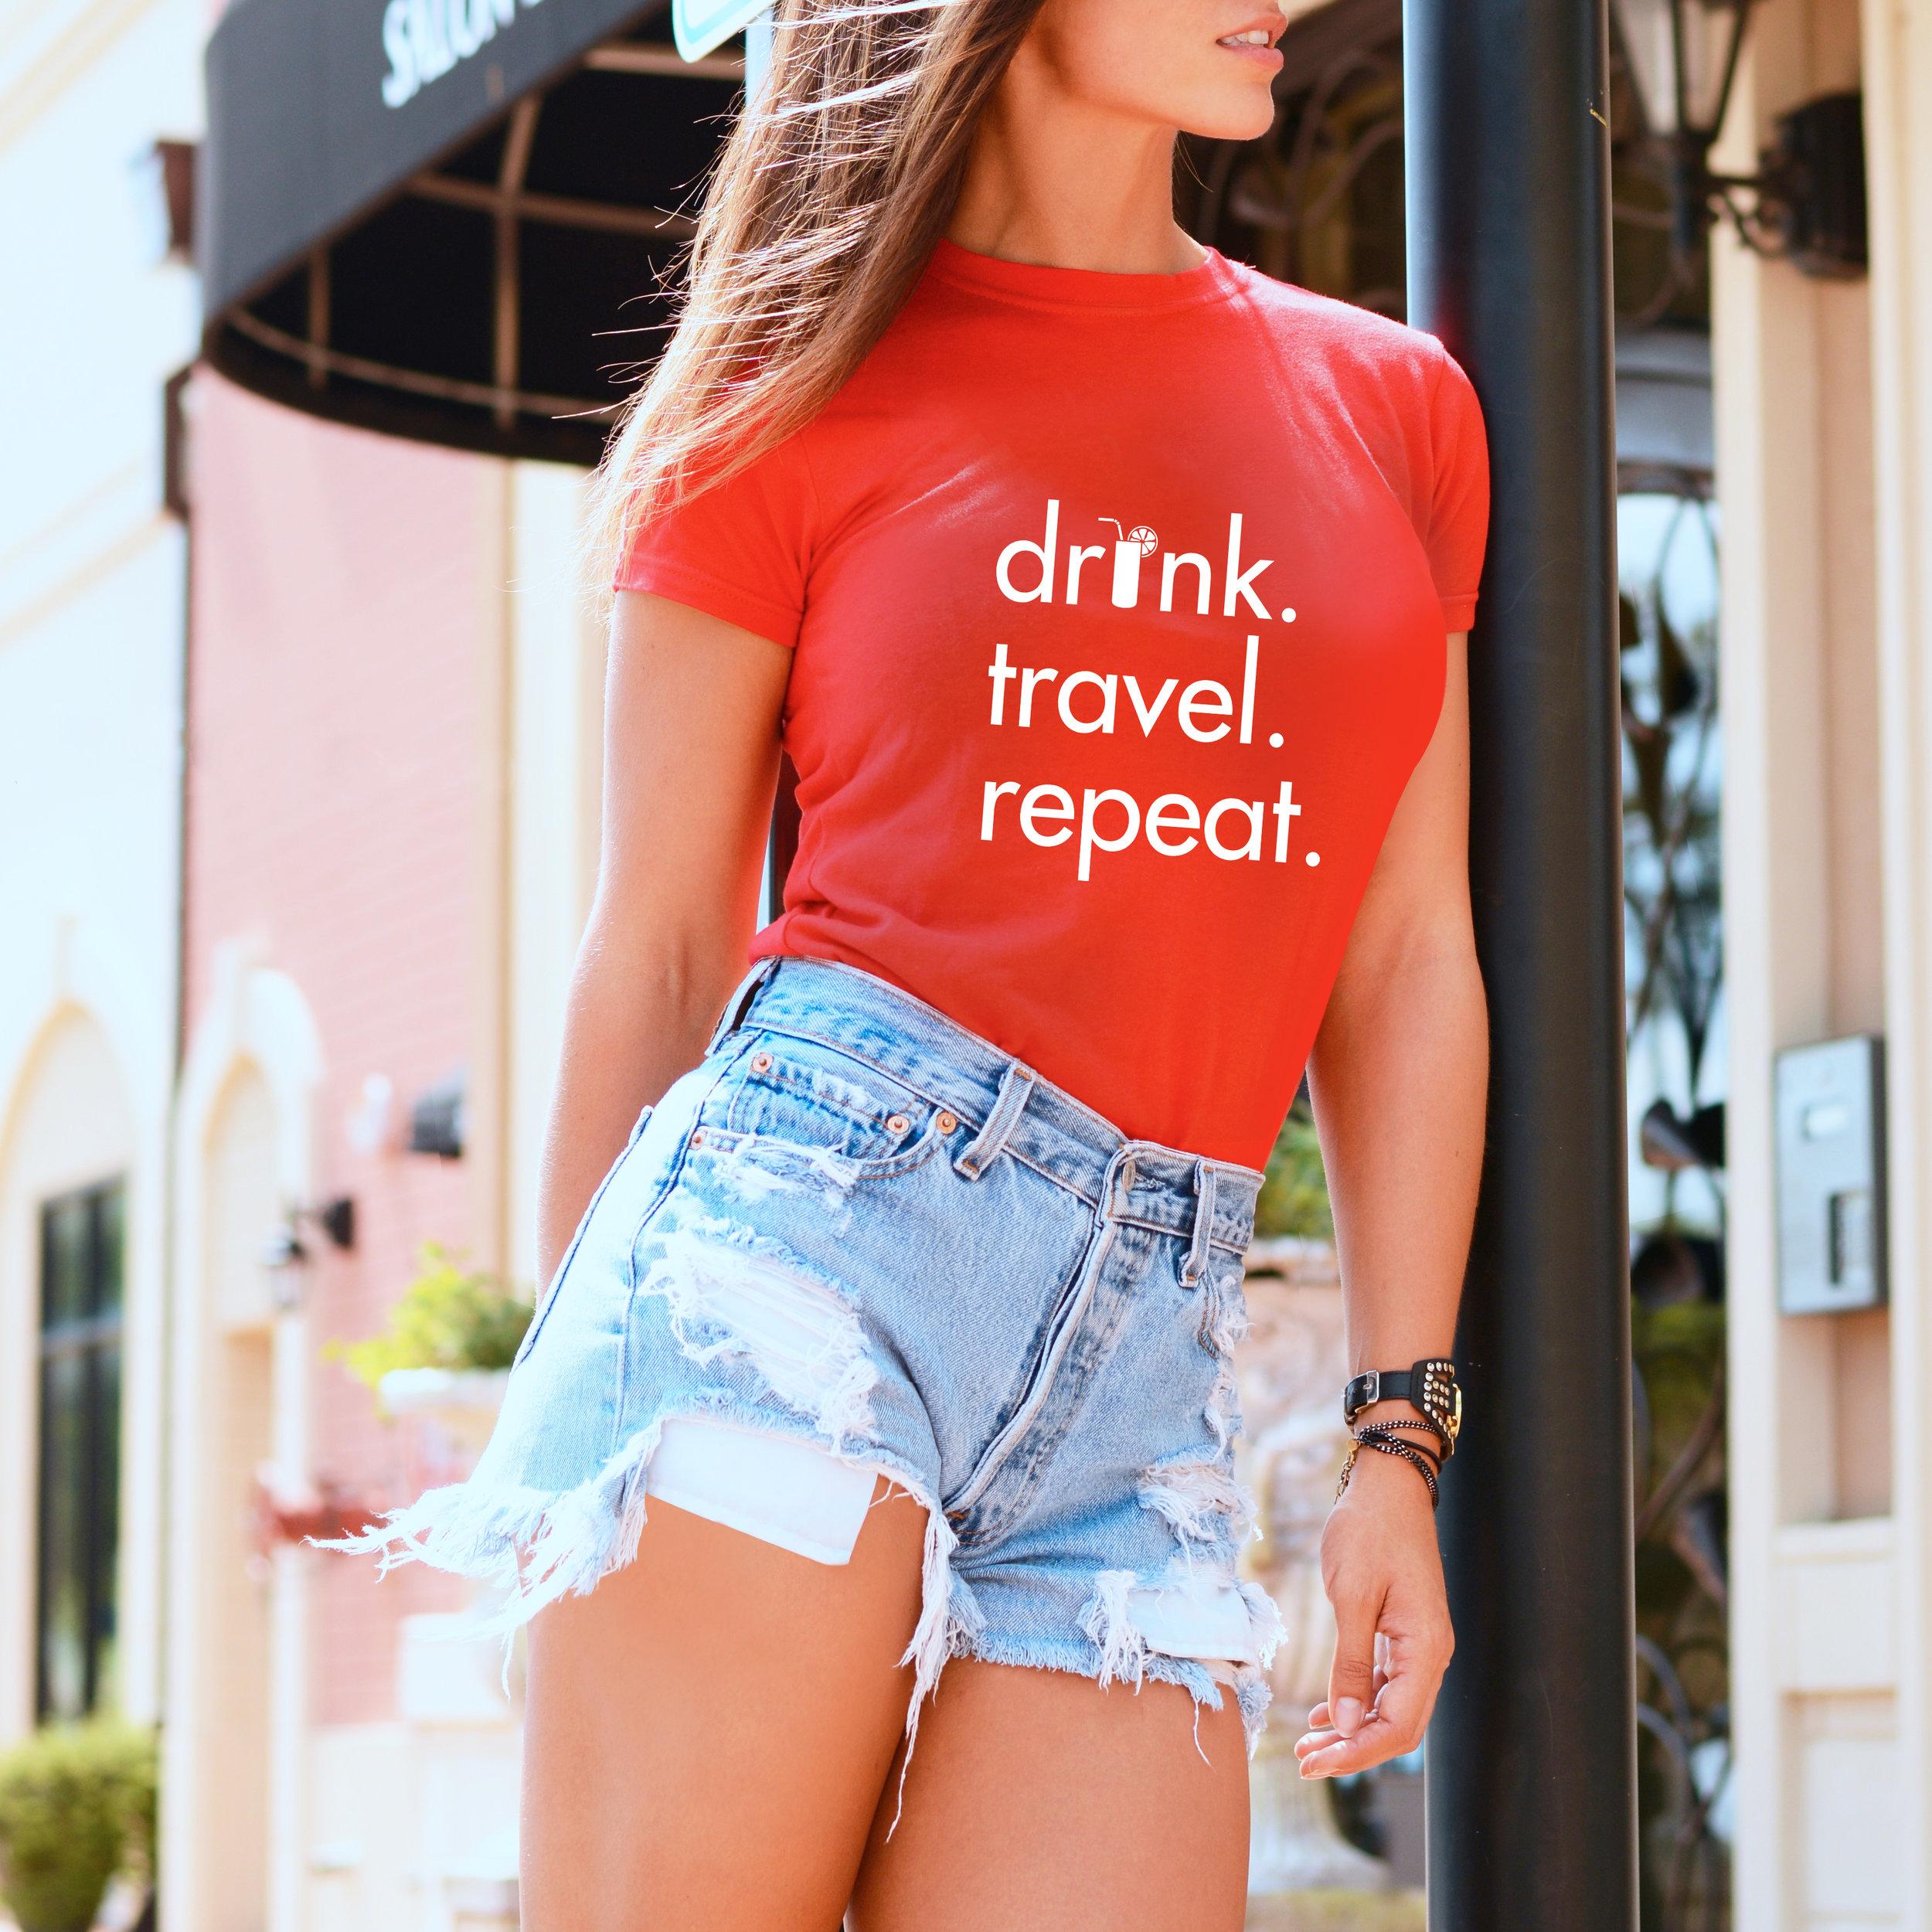 Women-T-Shirt-Mockup-PSD-100-DesignYep-com_DrinkTRavelRepeat.jpg